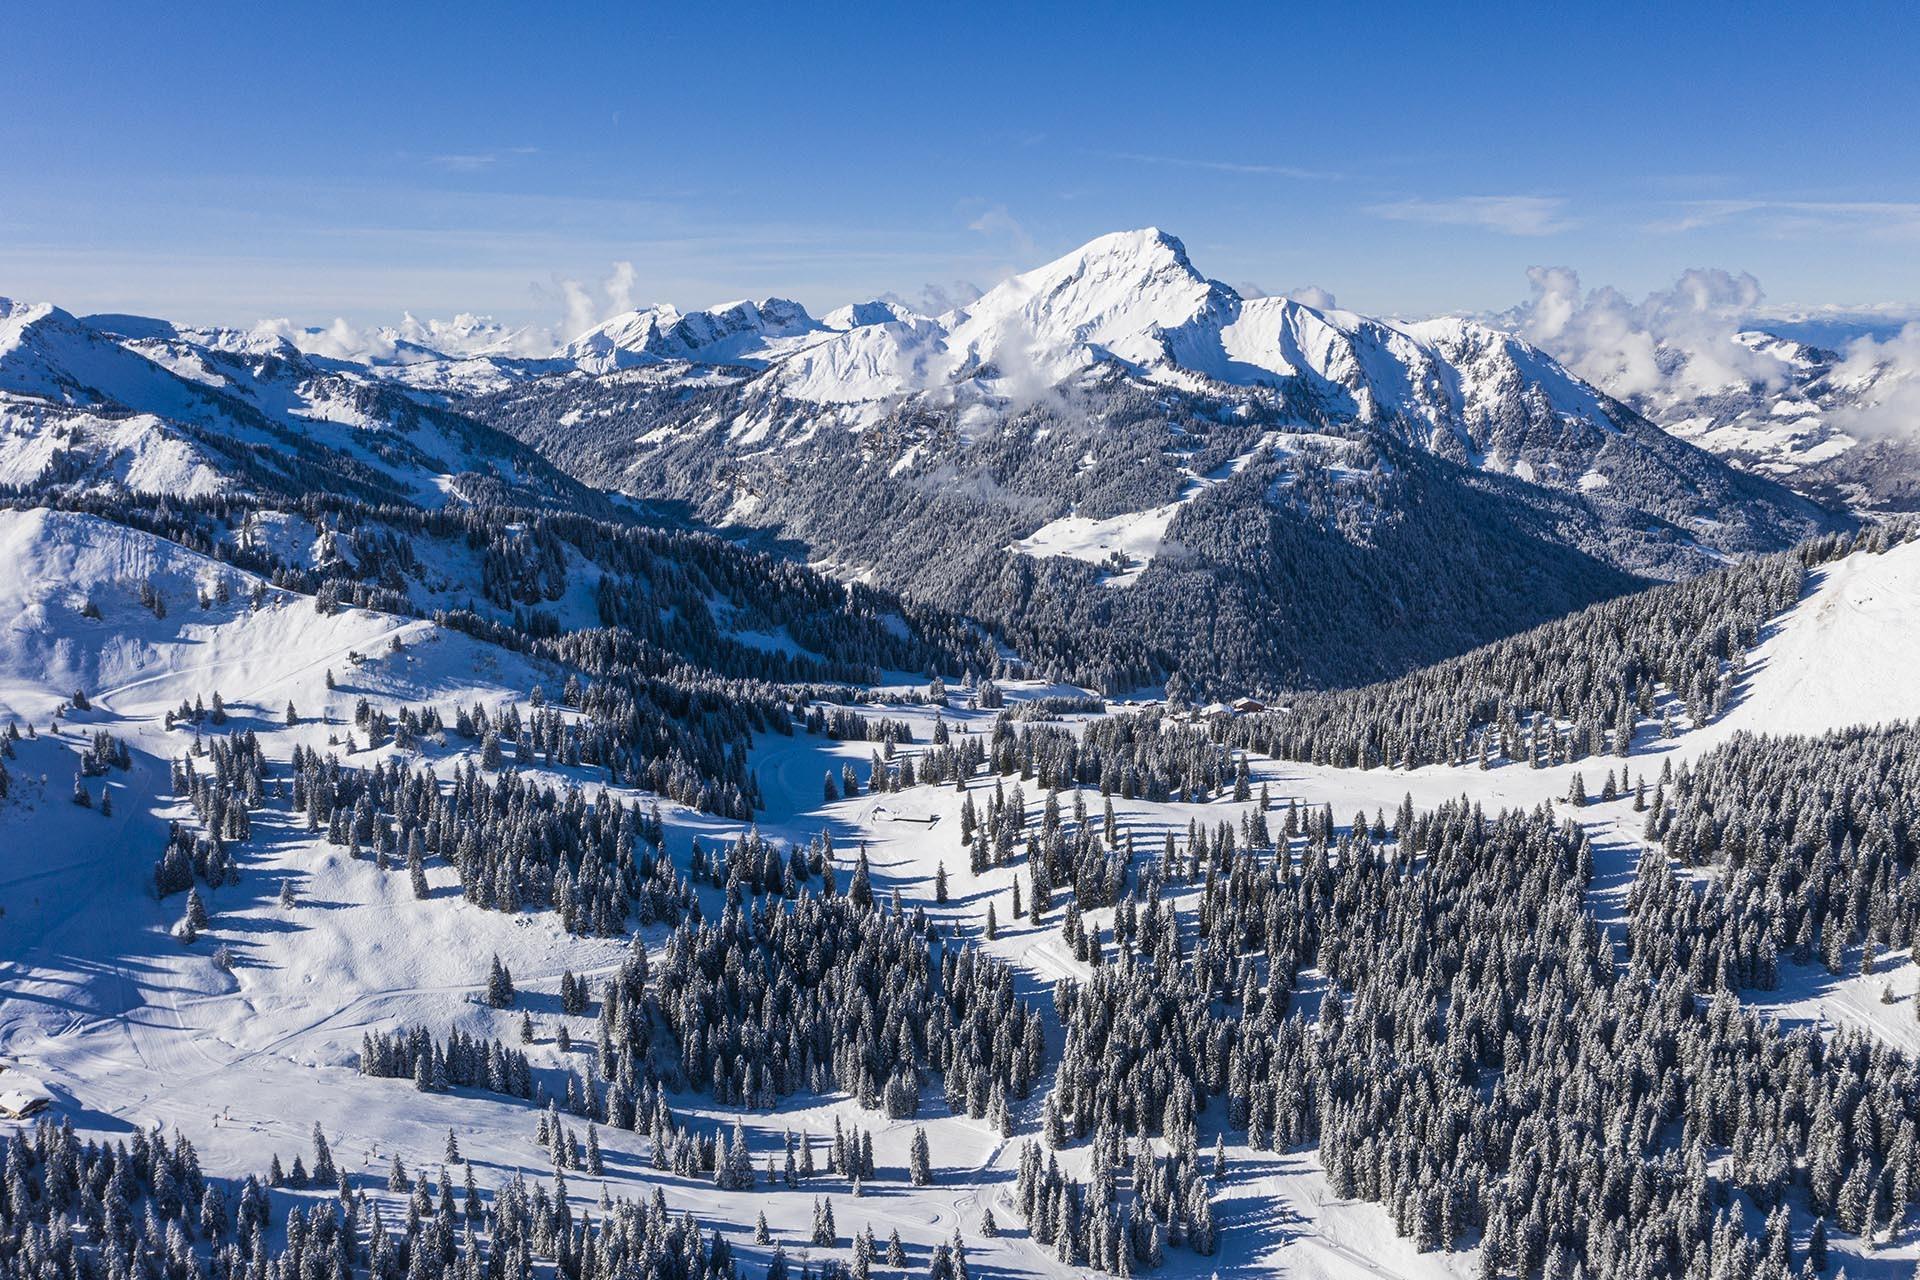 On the ski area